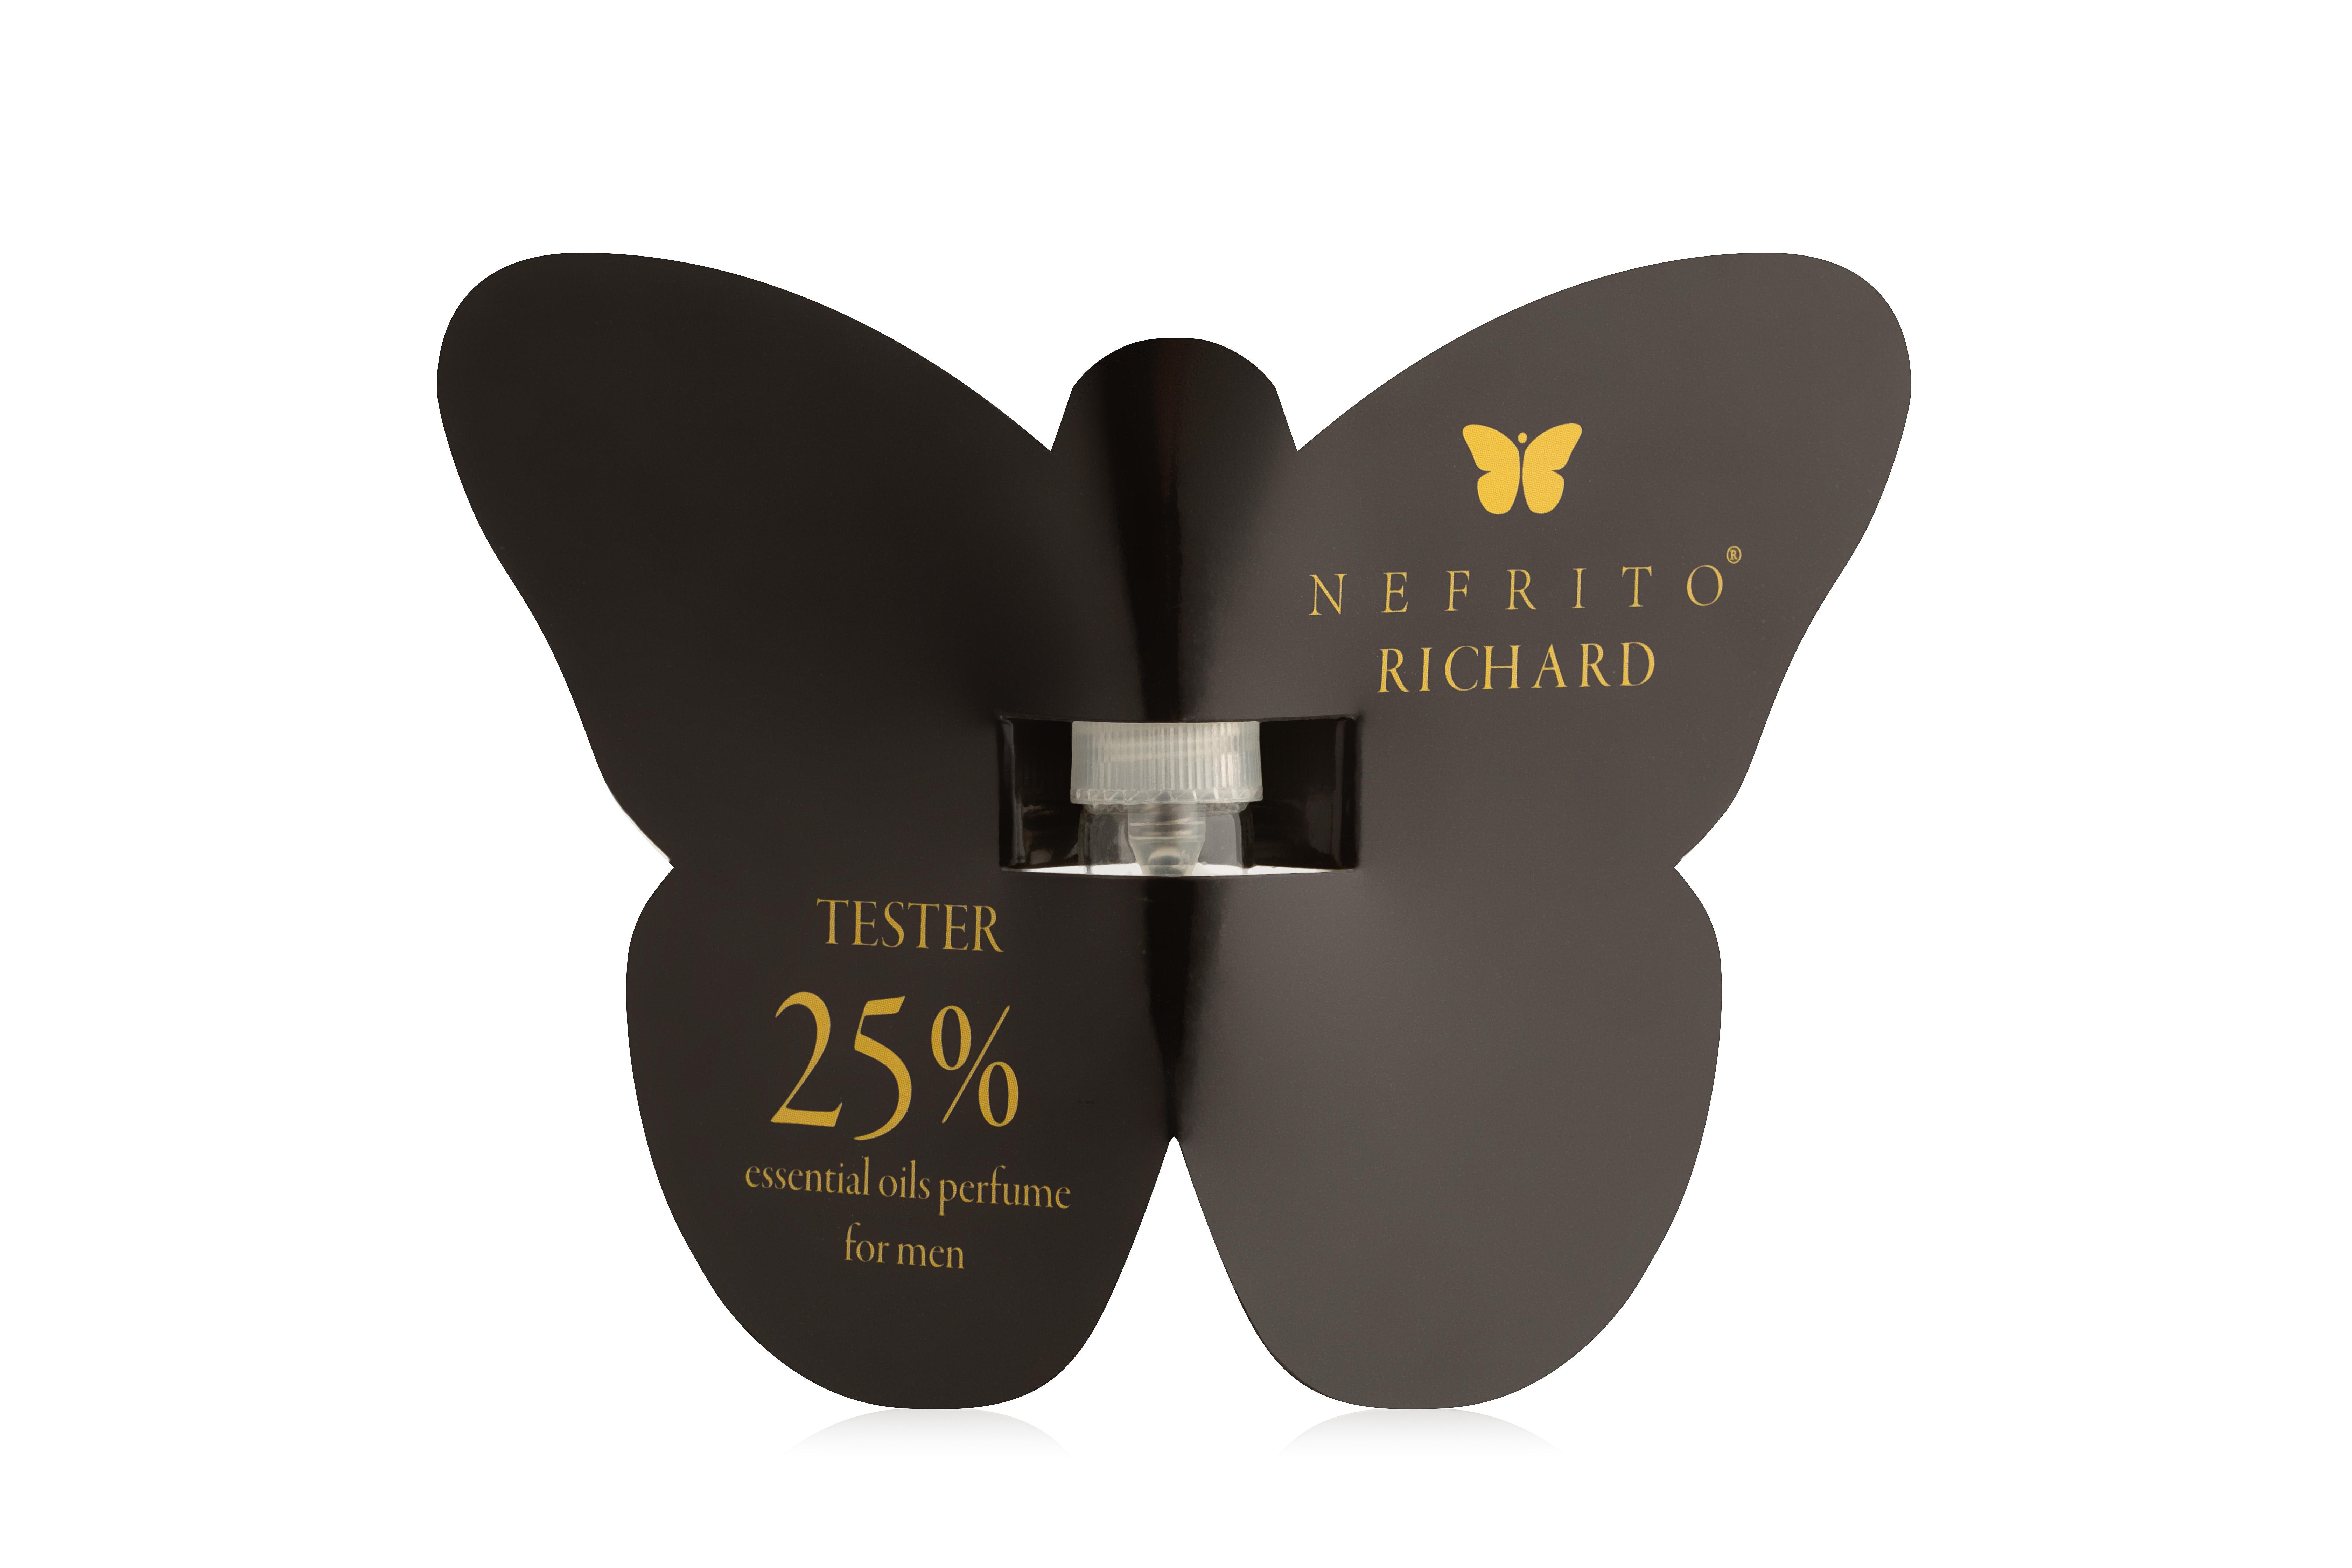 nefrito-butterfly-outside-richard